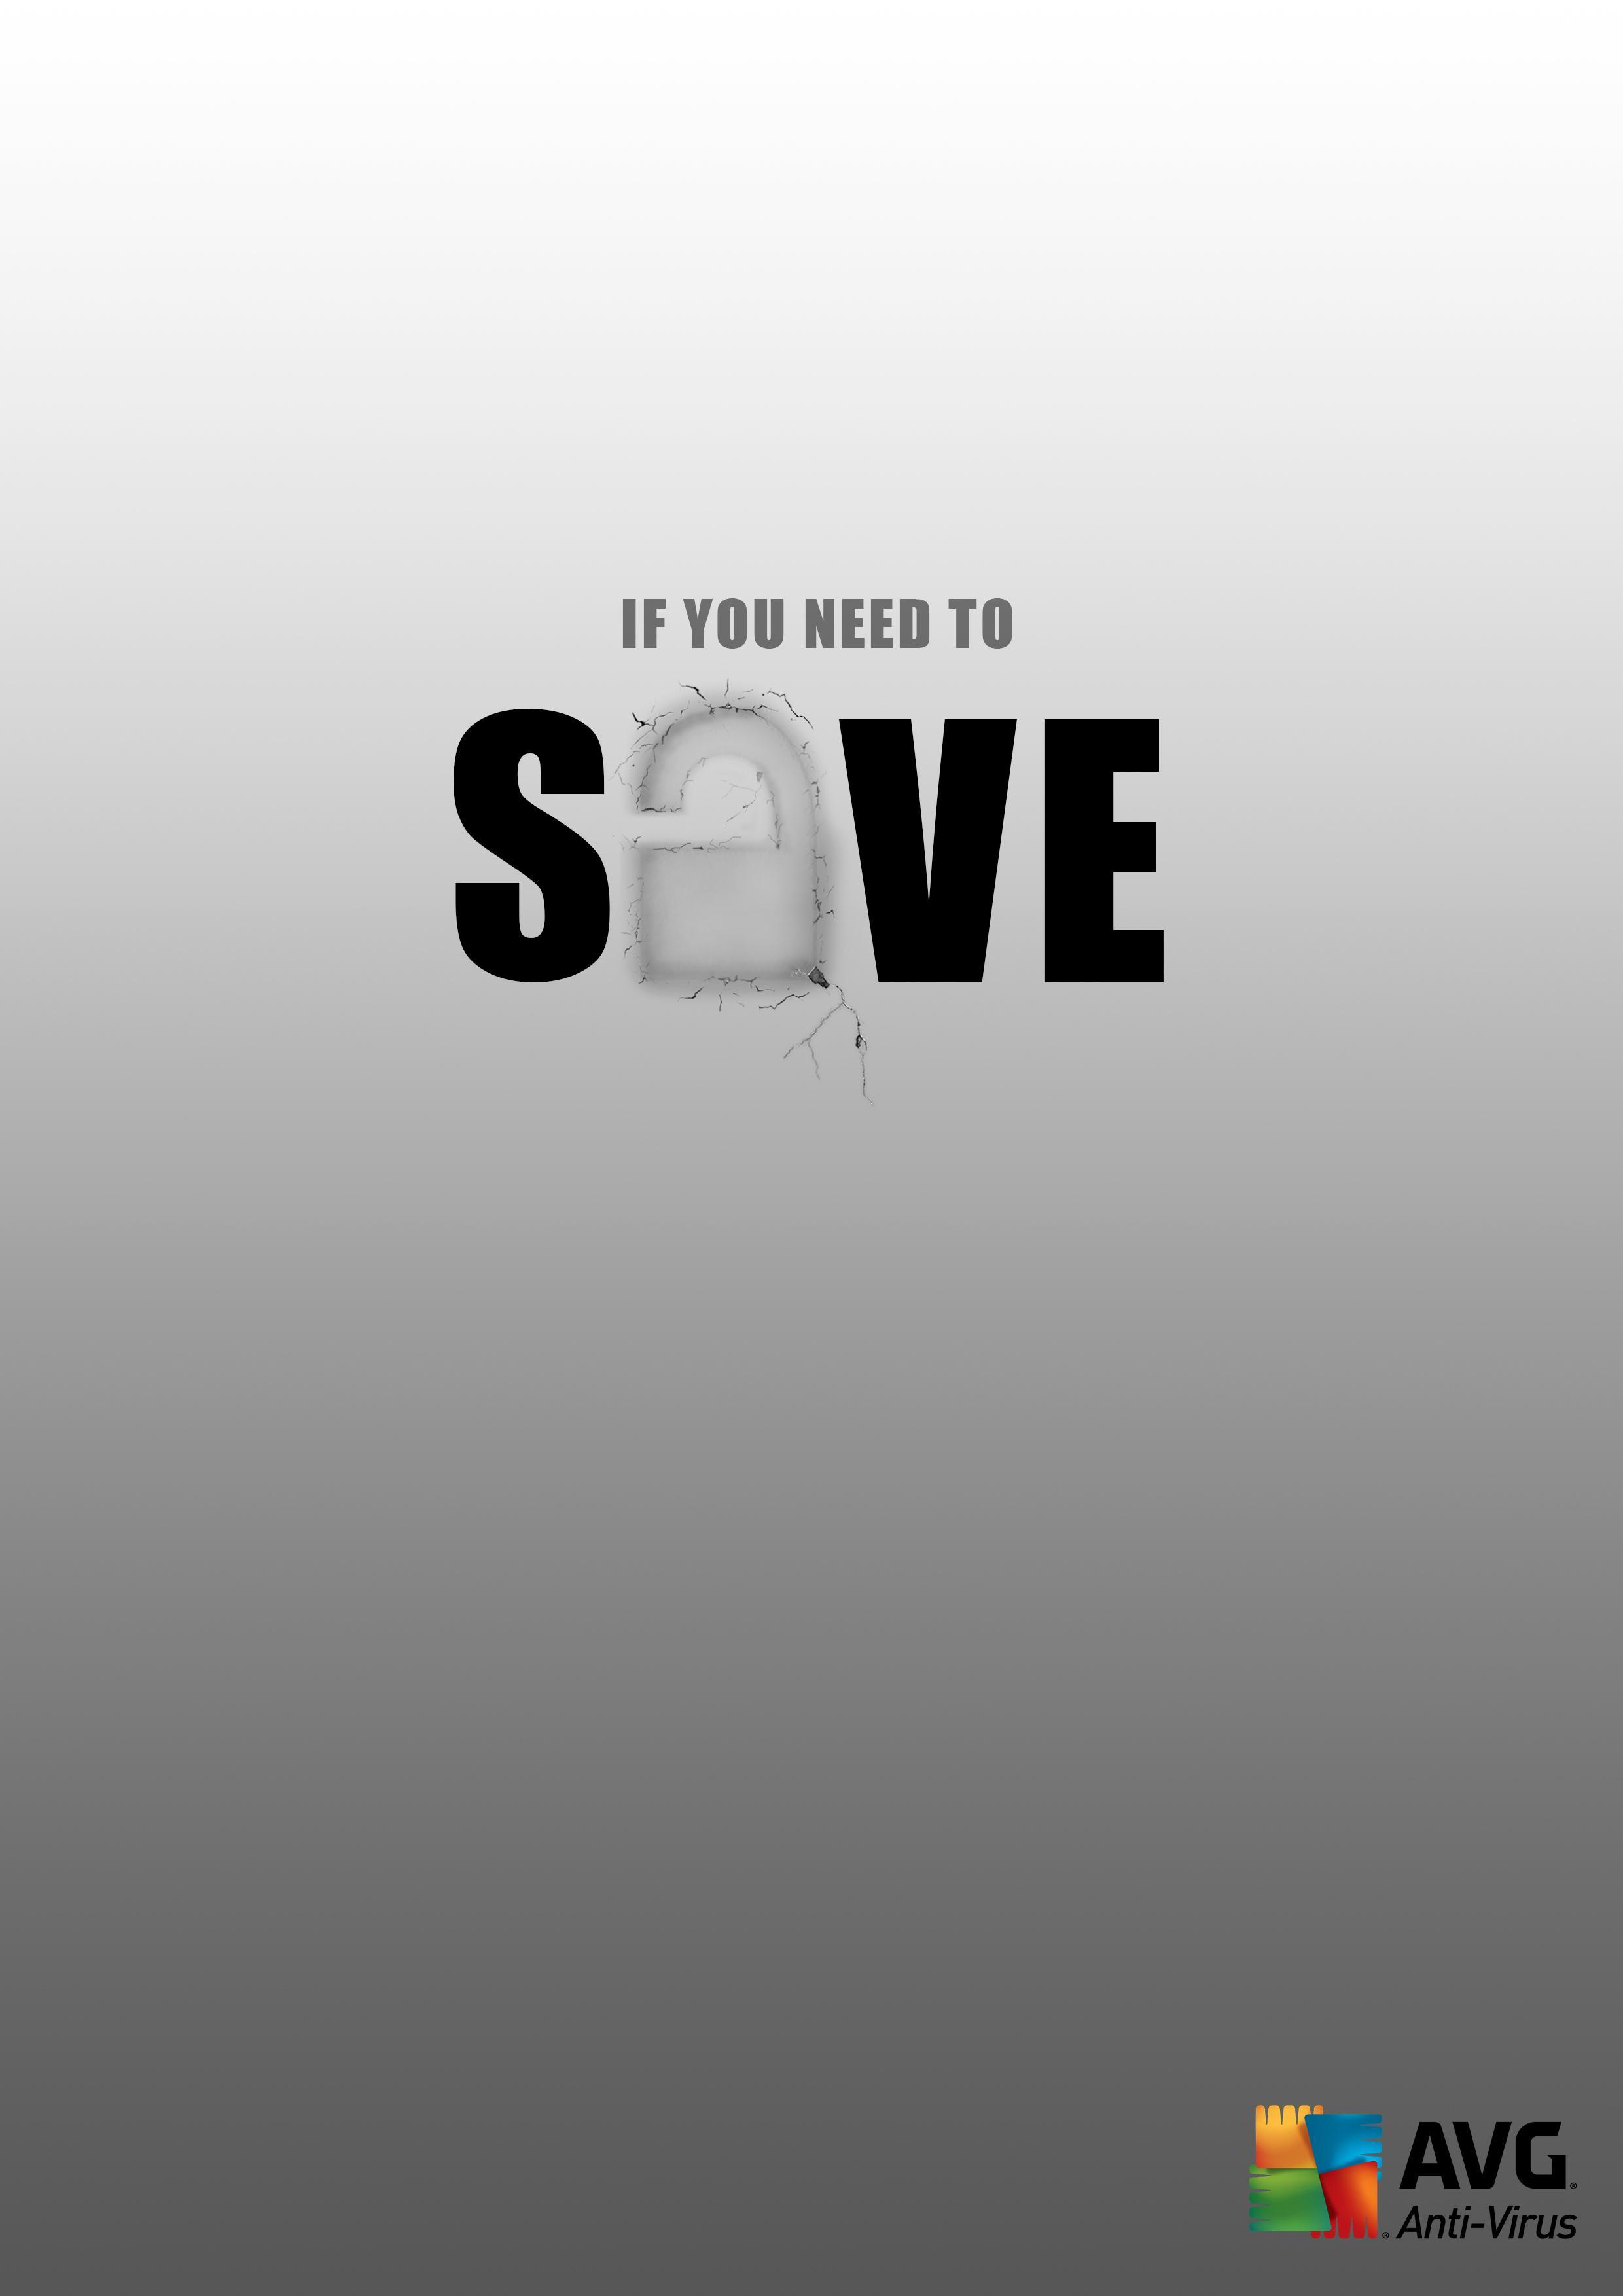 AVG Print Ad - Save